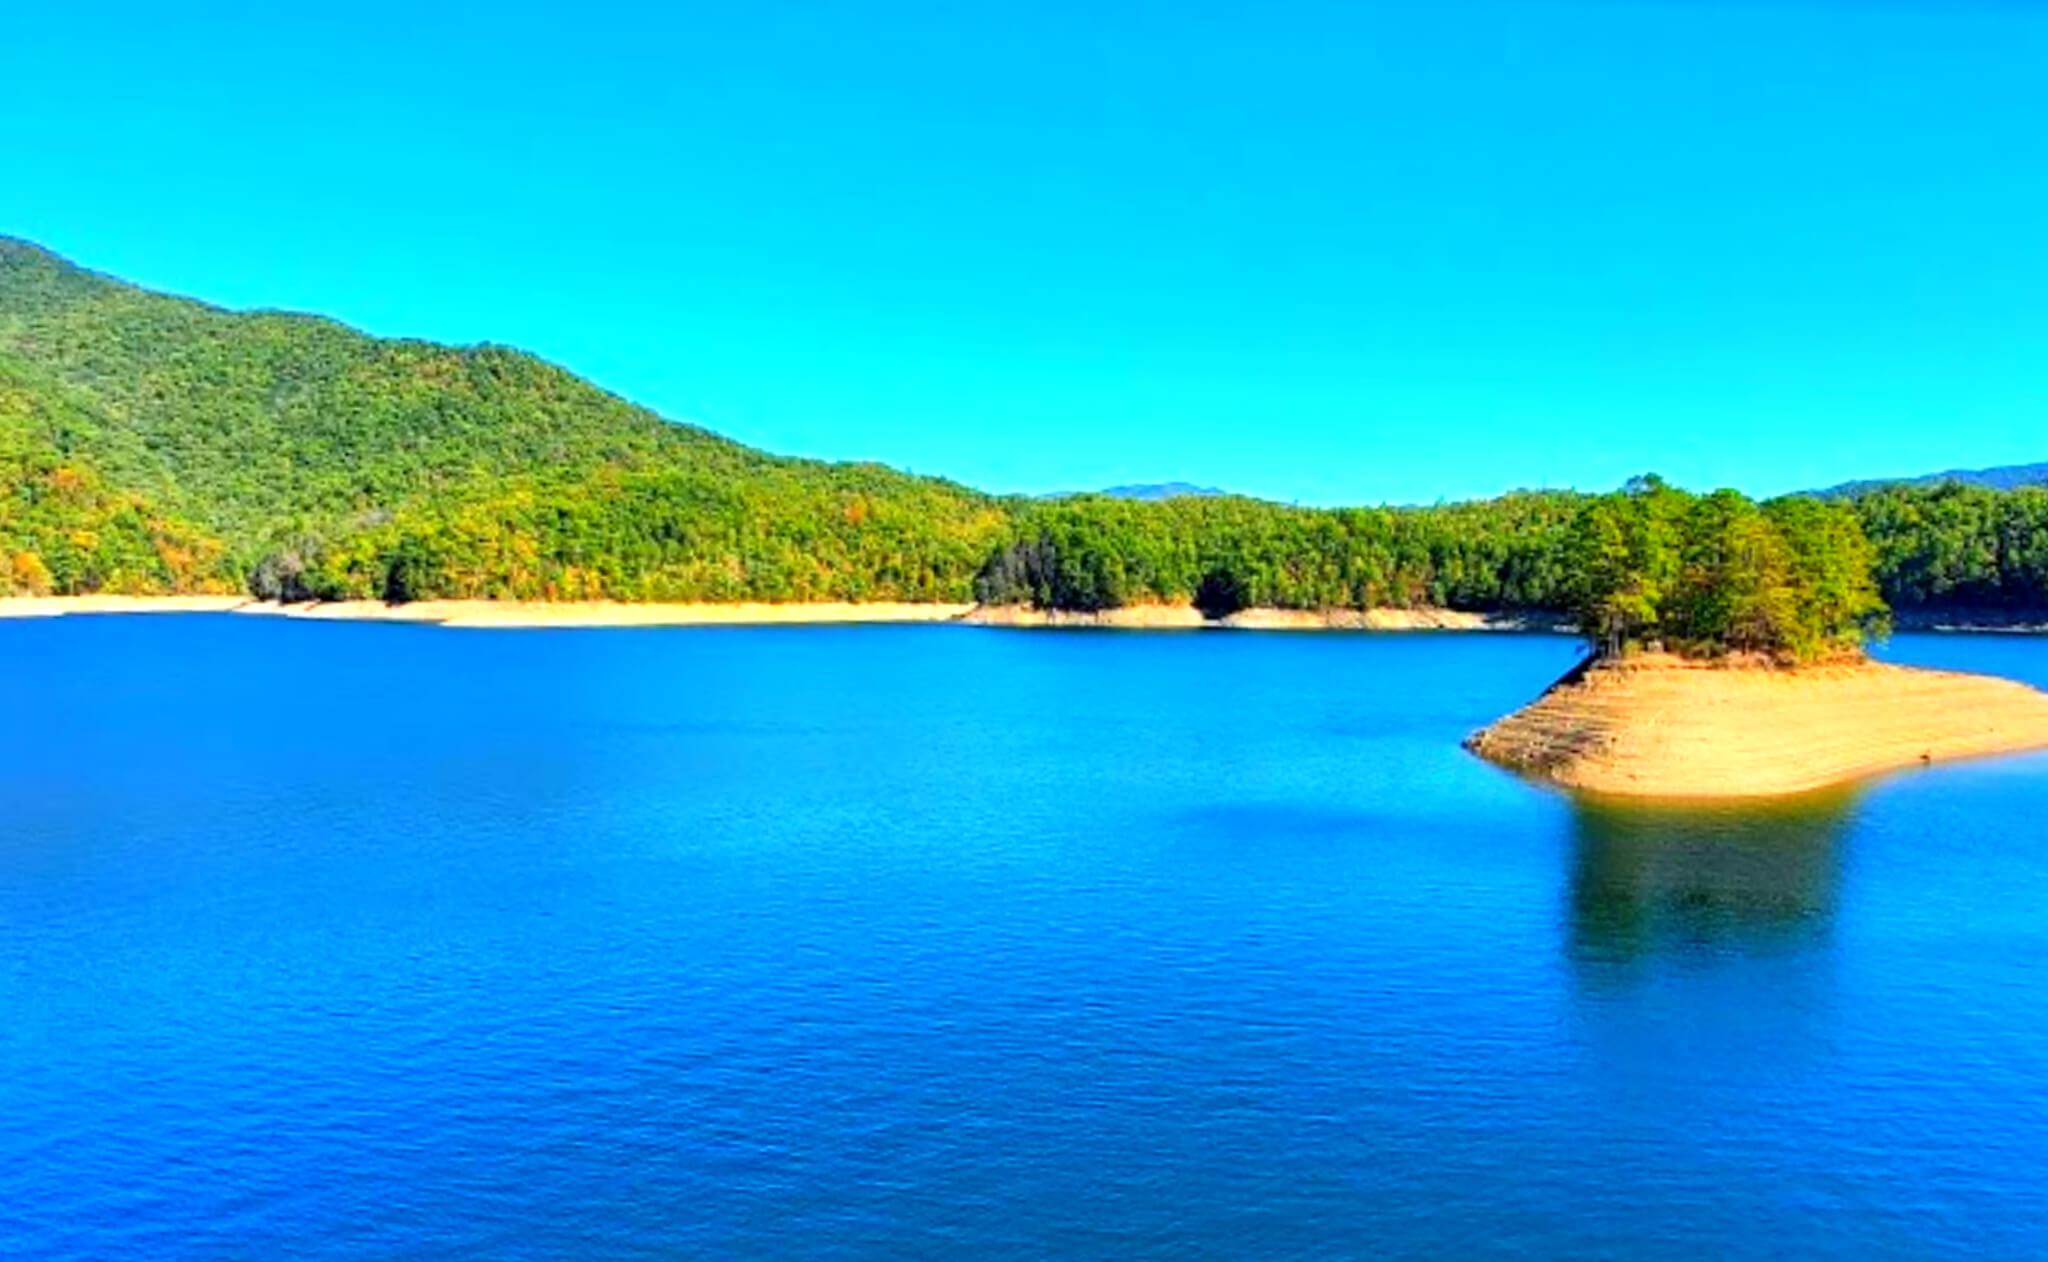 Fontana-Lake-Fishing-Report-Guide-North-Carolina-NC-02